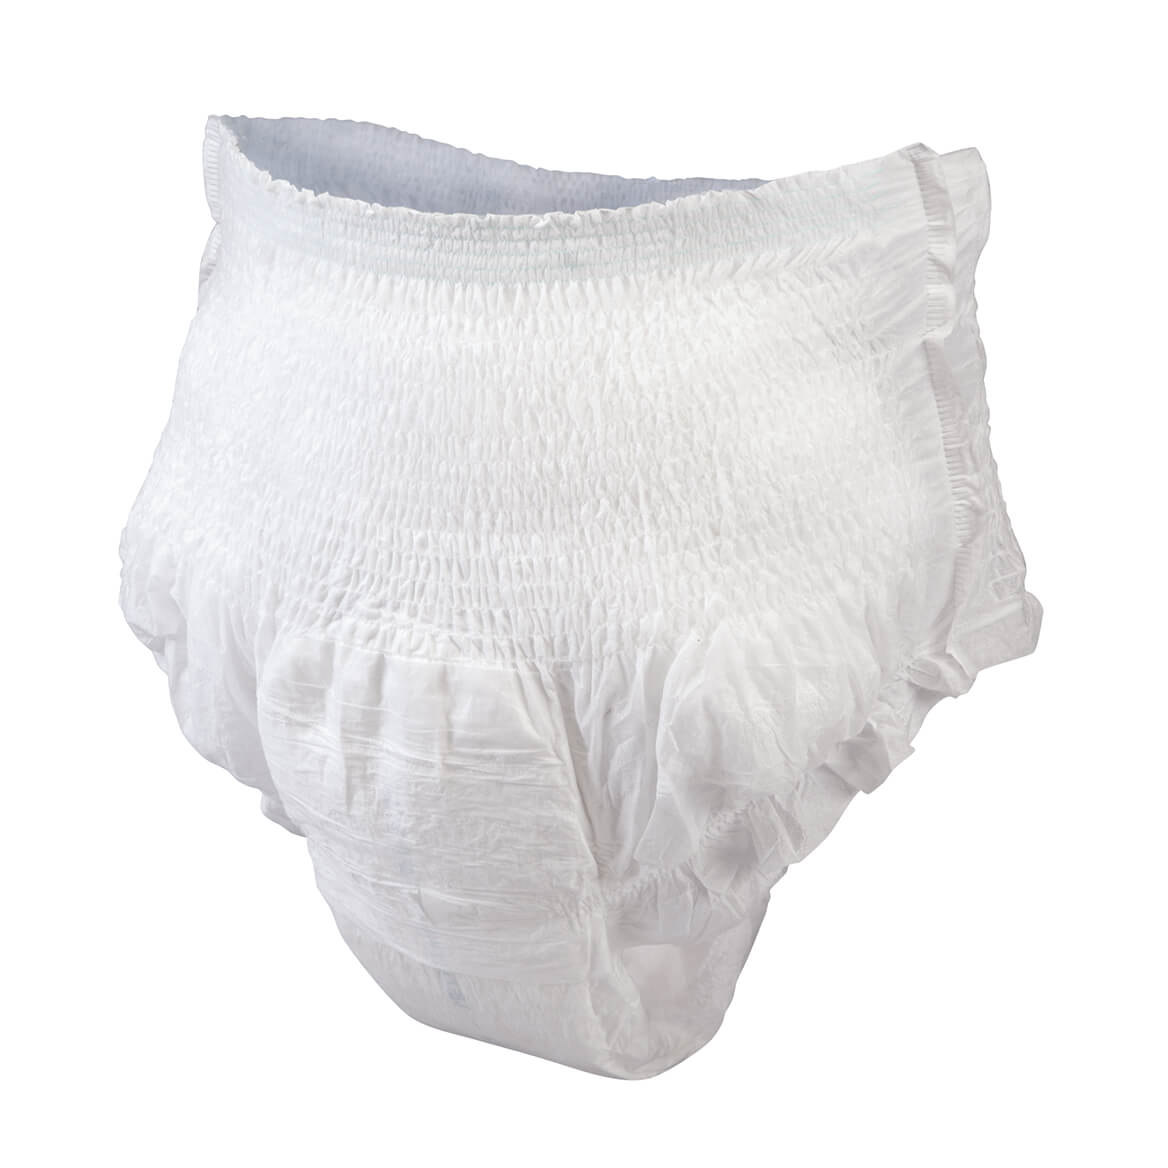 Unisex Overnight Protective Underwear, pkg.-344824